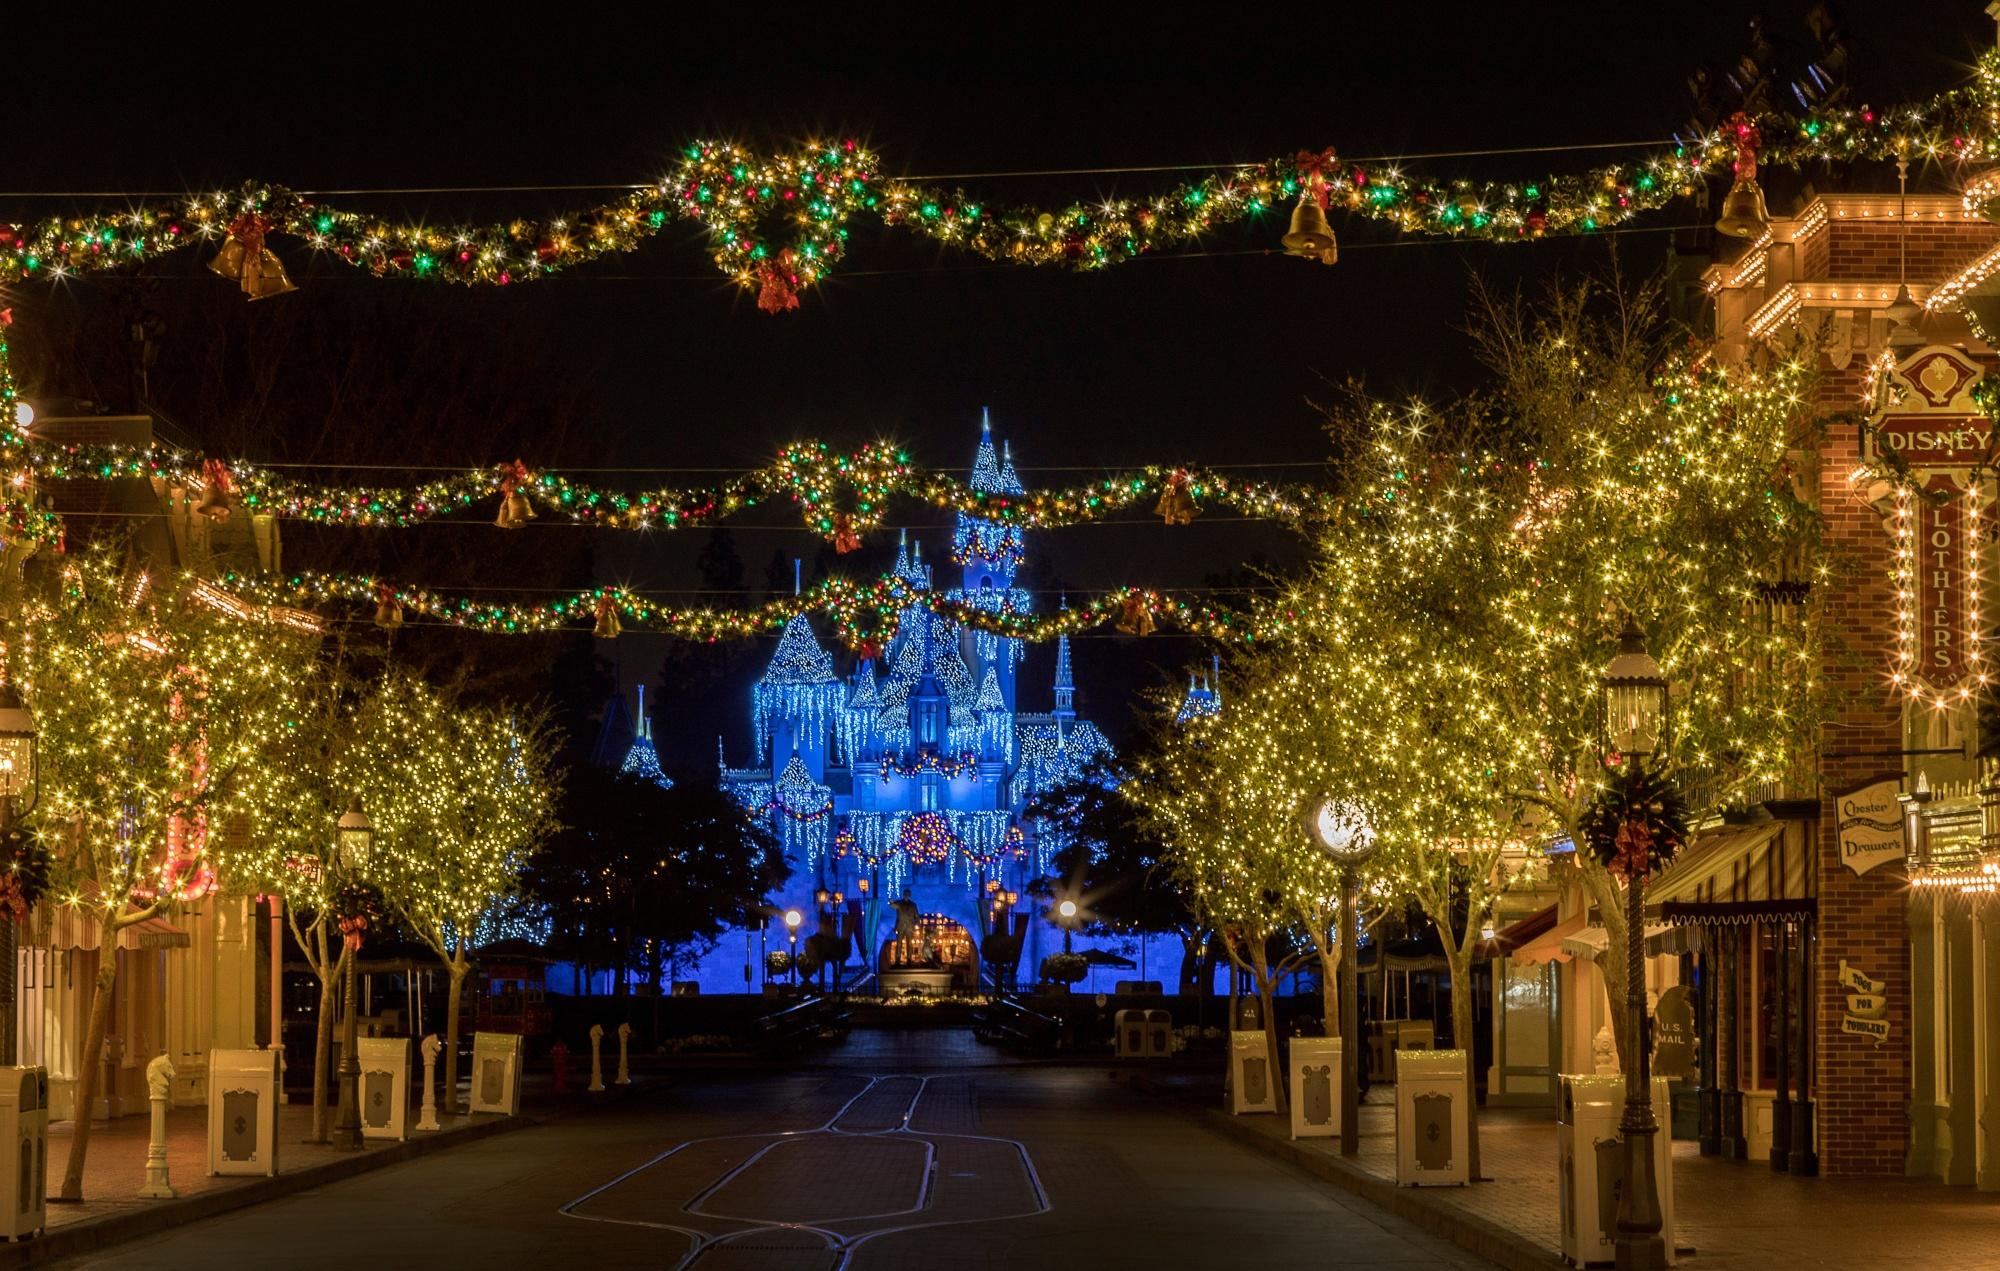 Disneyland holiday decorations on Main Street and Sleeping Beauty Castle